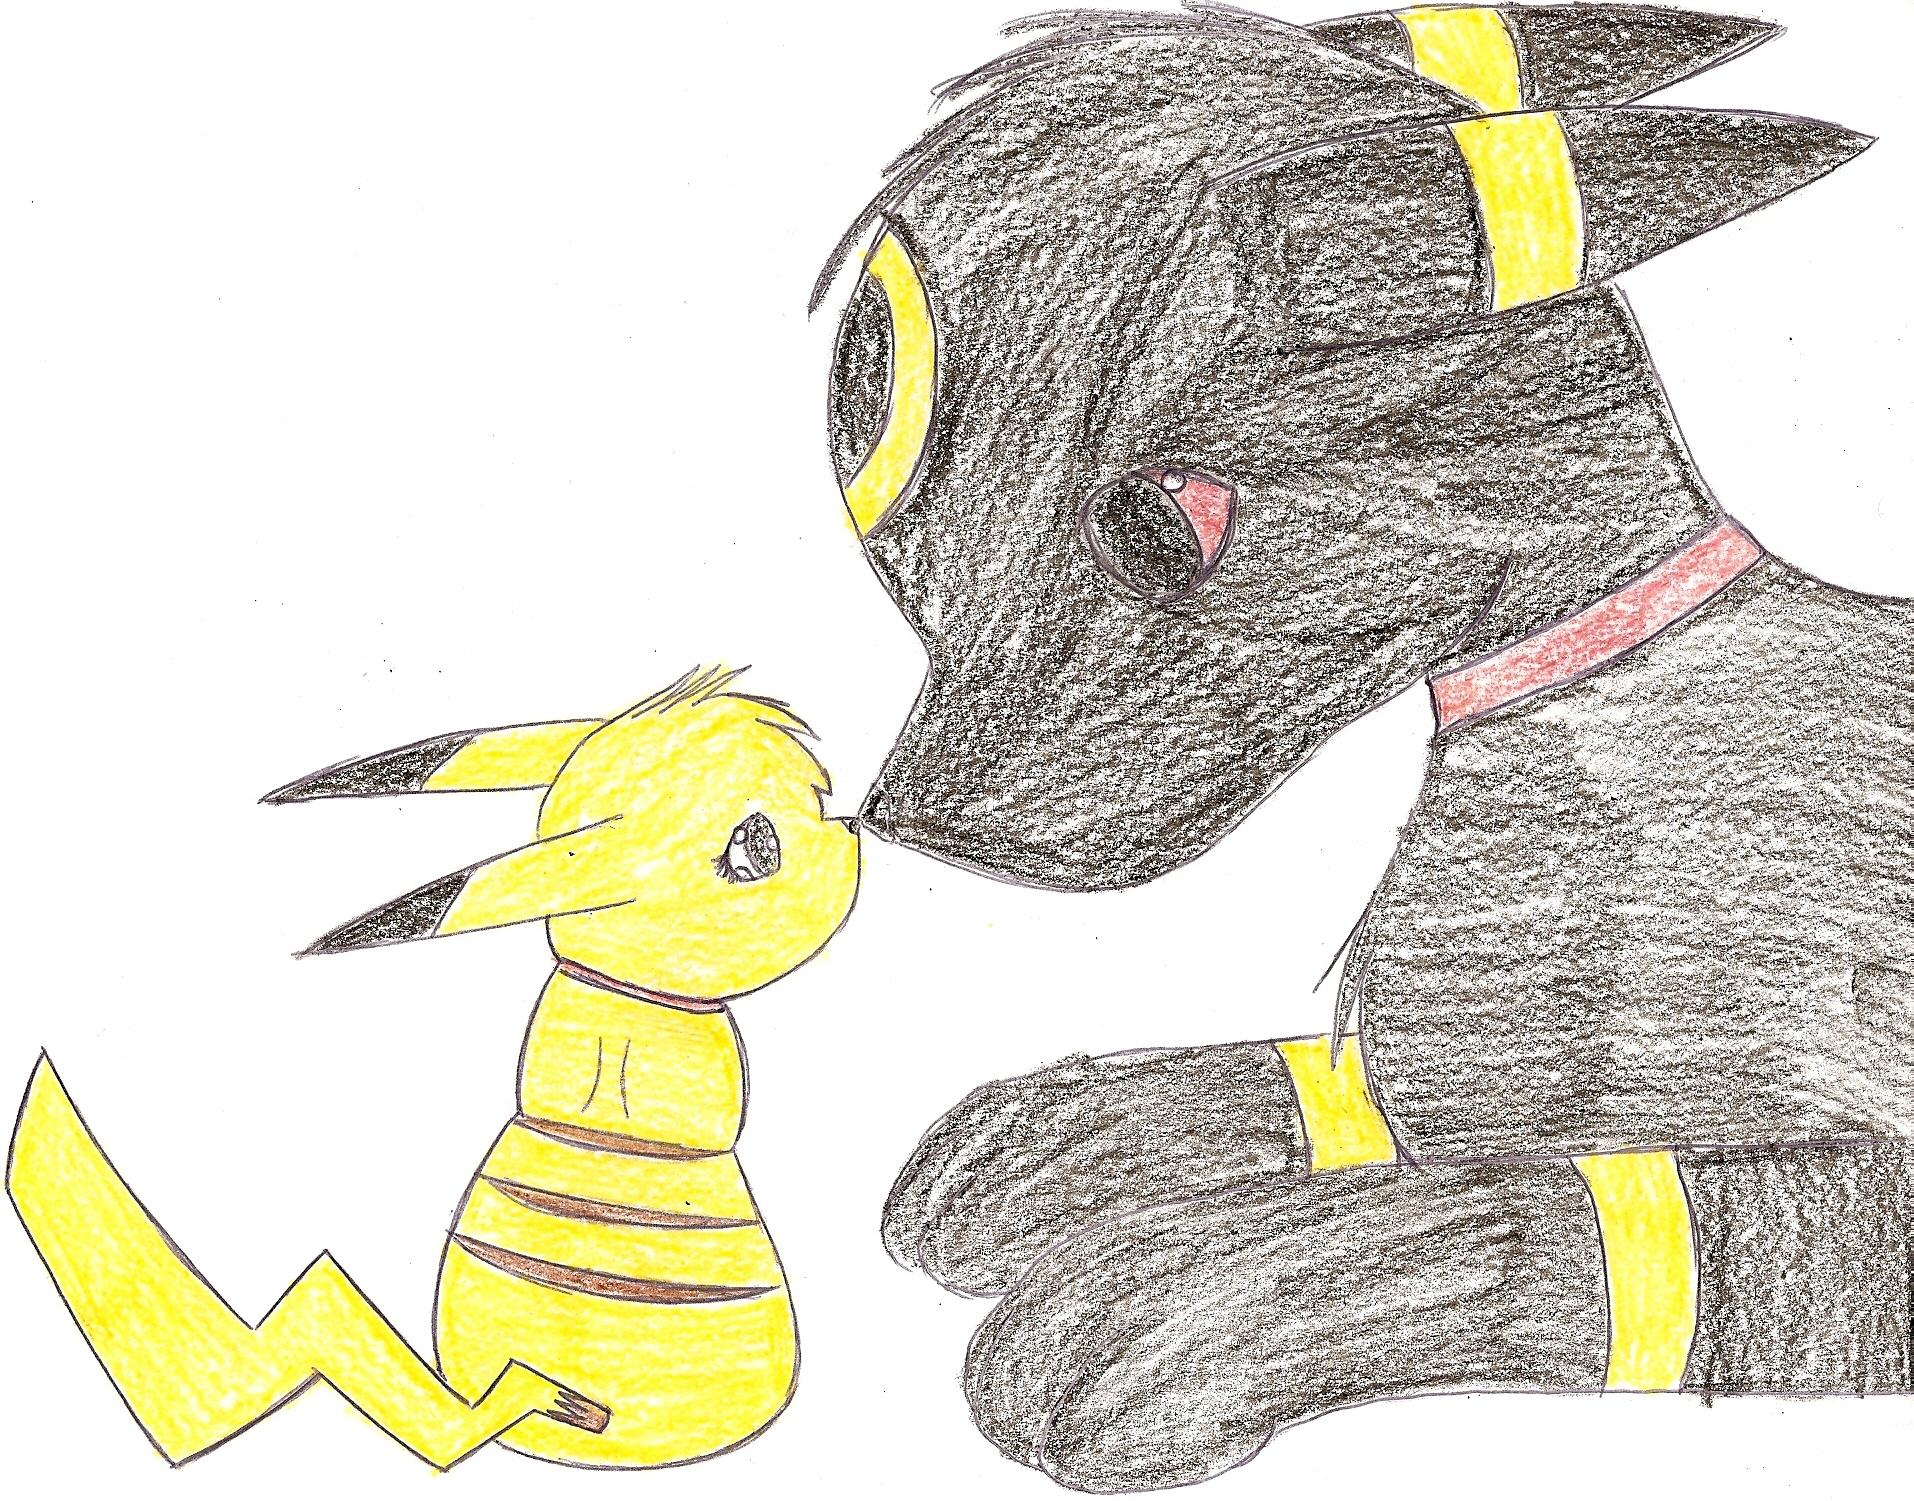 Umbreon and Pikachu